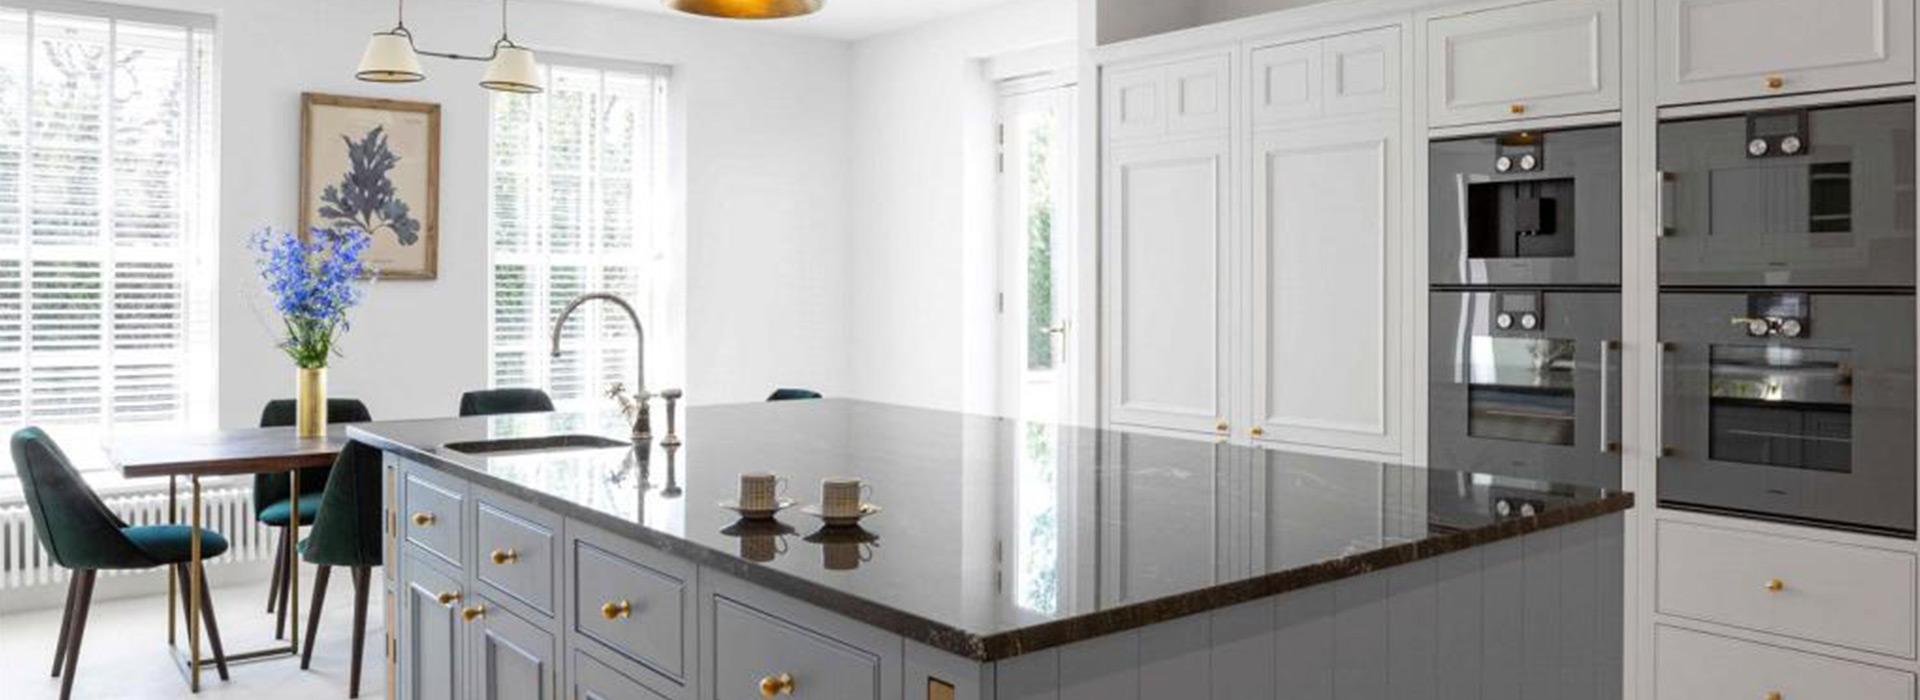 Grey and white shaker kitchen